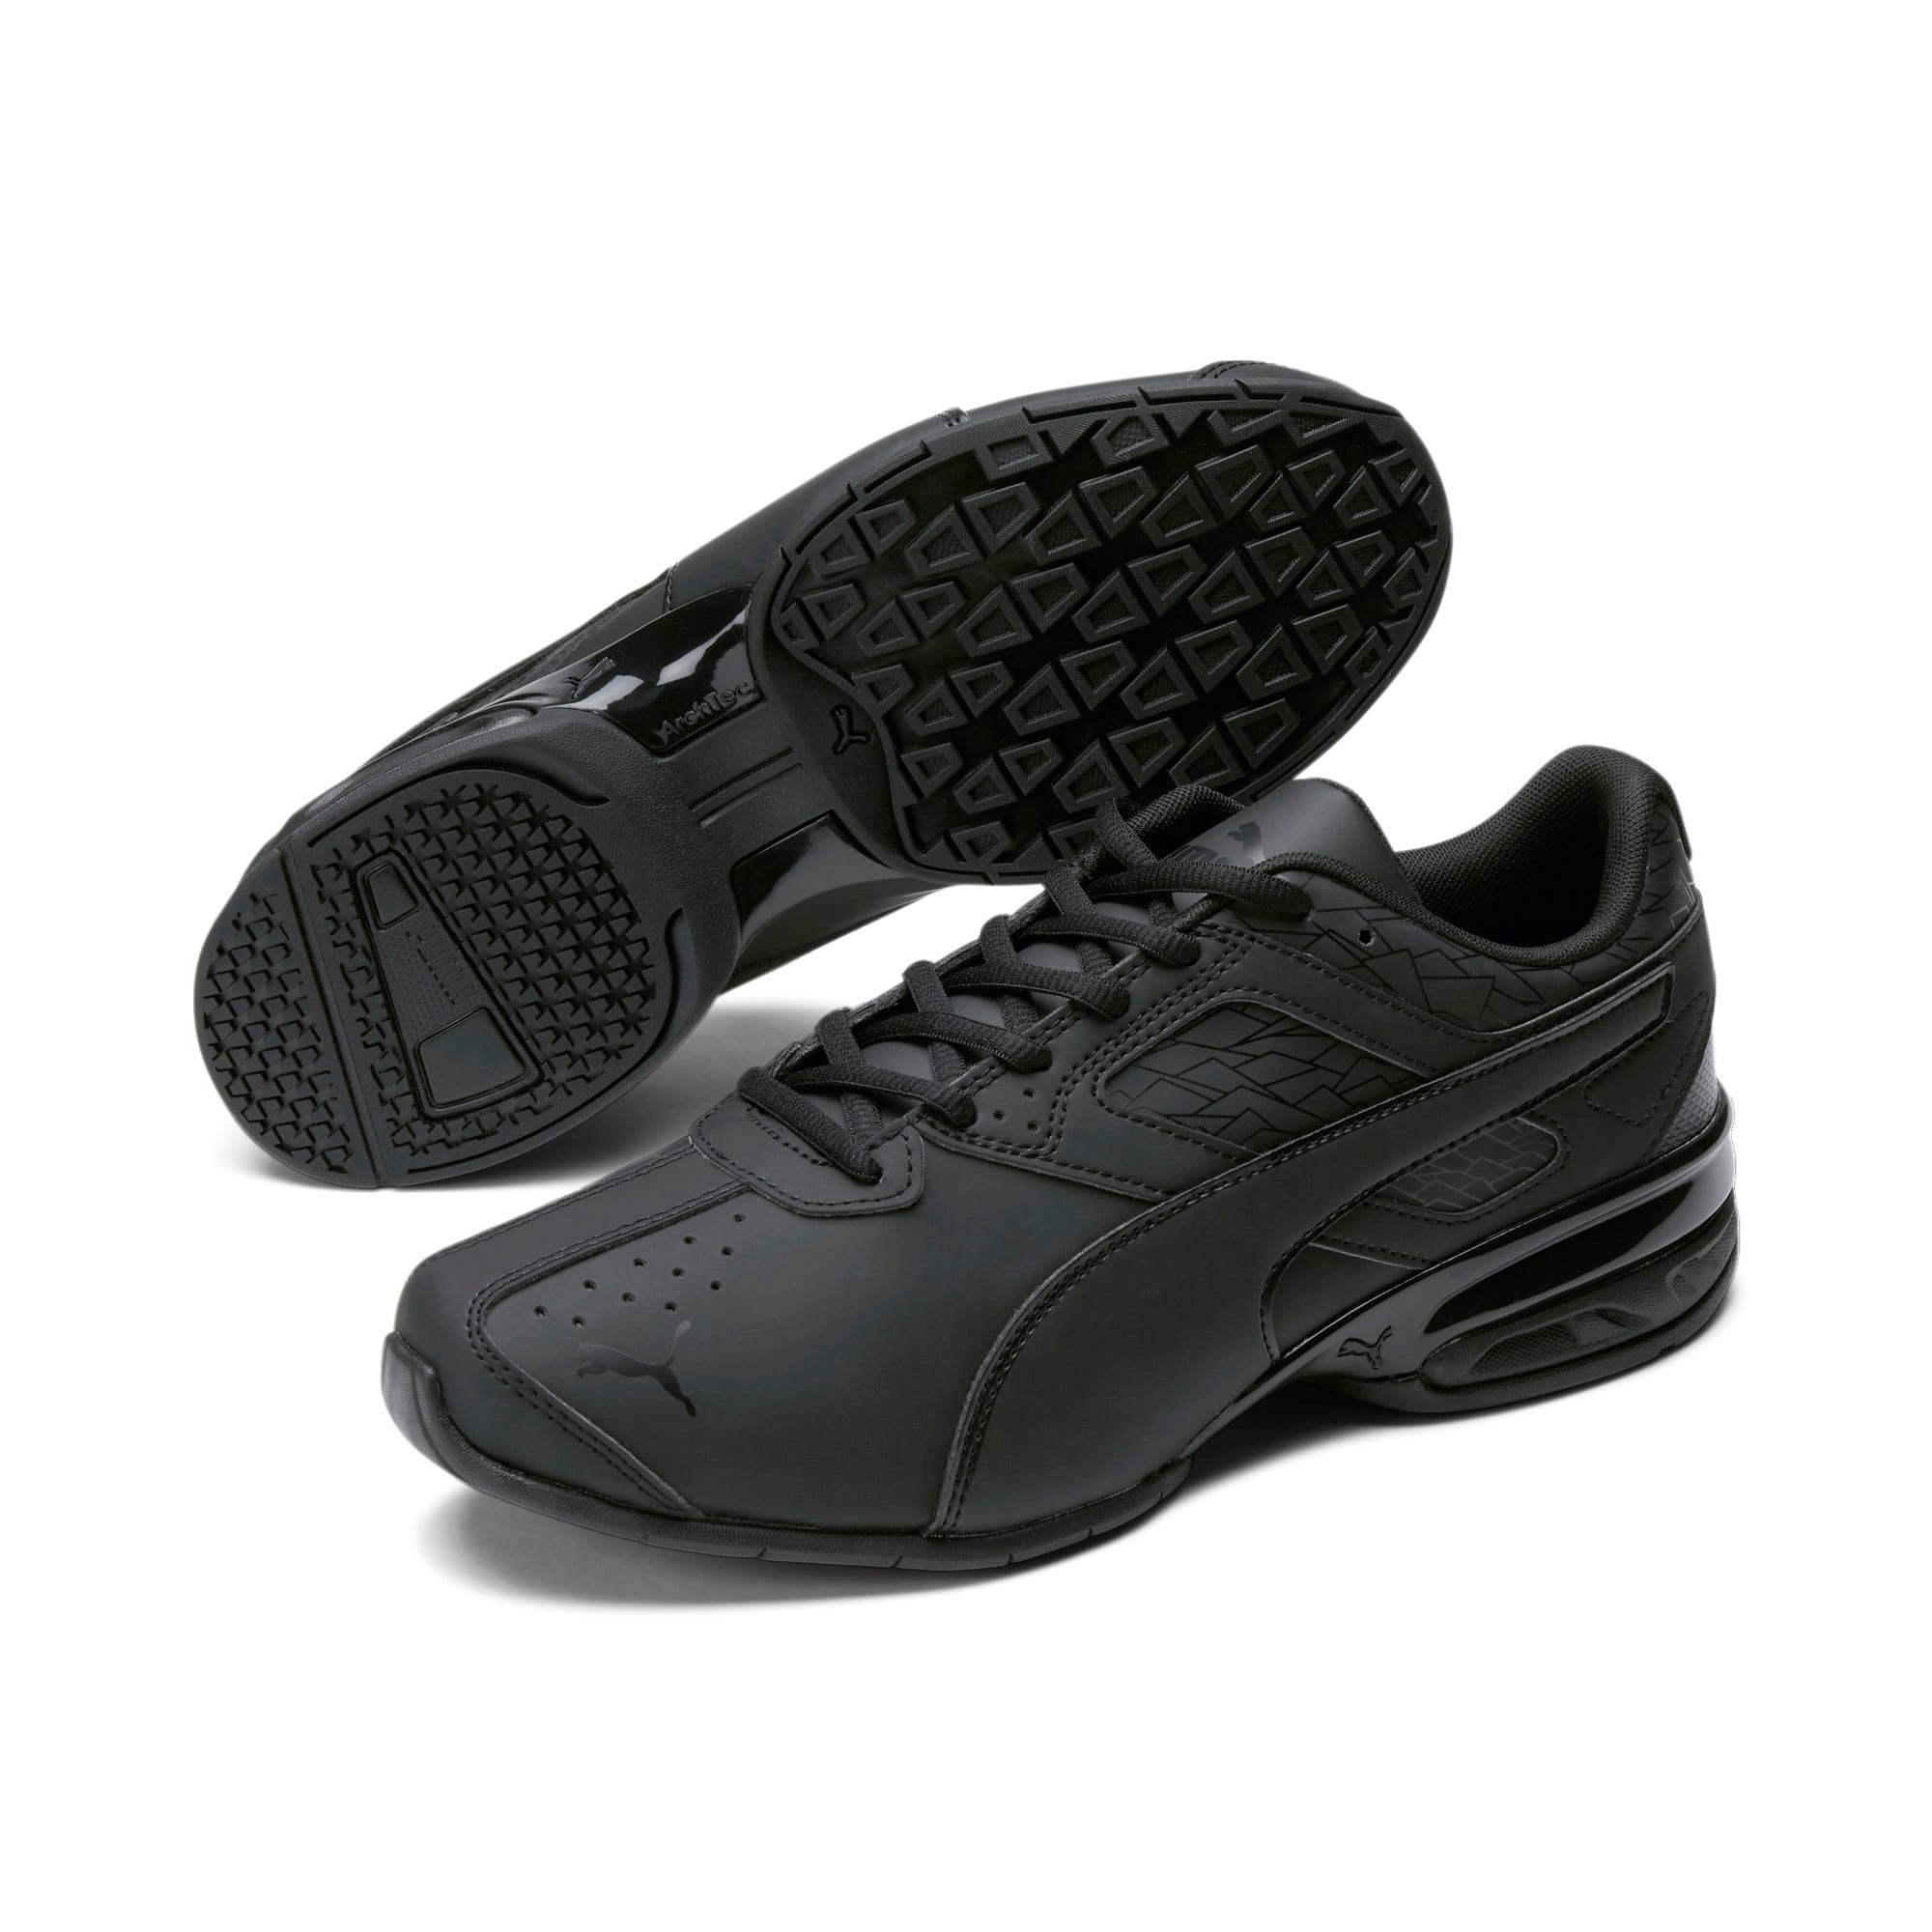 Thumbnail 2 of Tazon 6 Fracture FM Men's Sneakers, Puma Black, medium